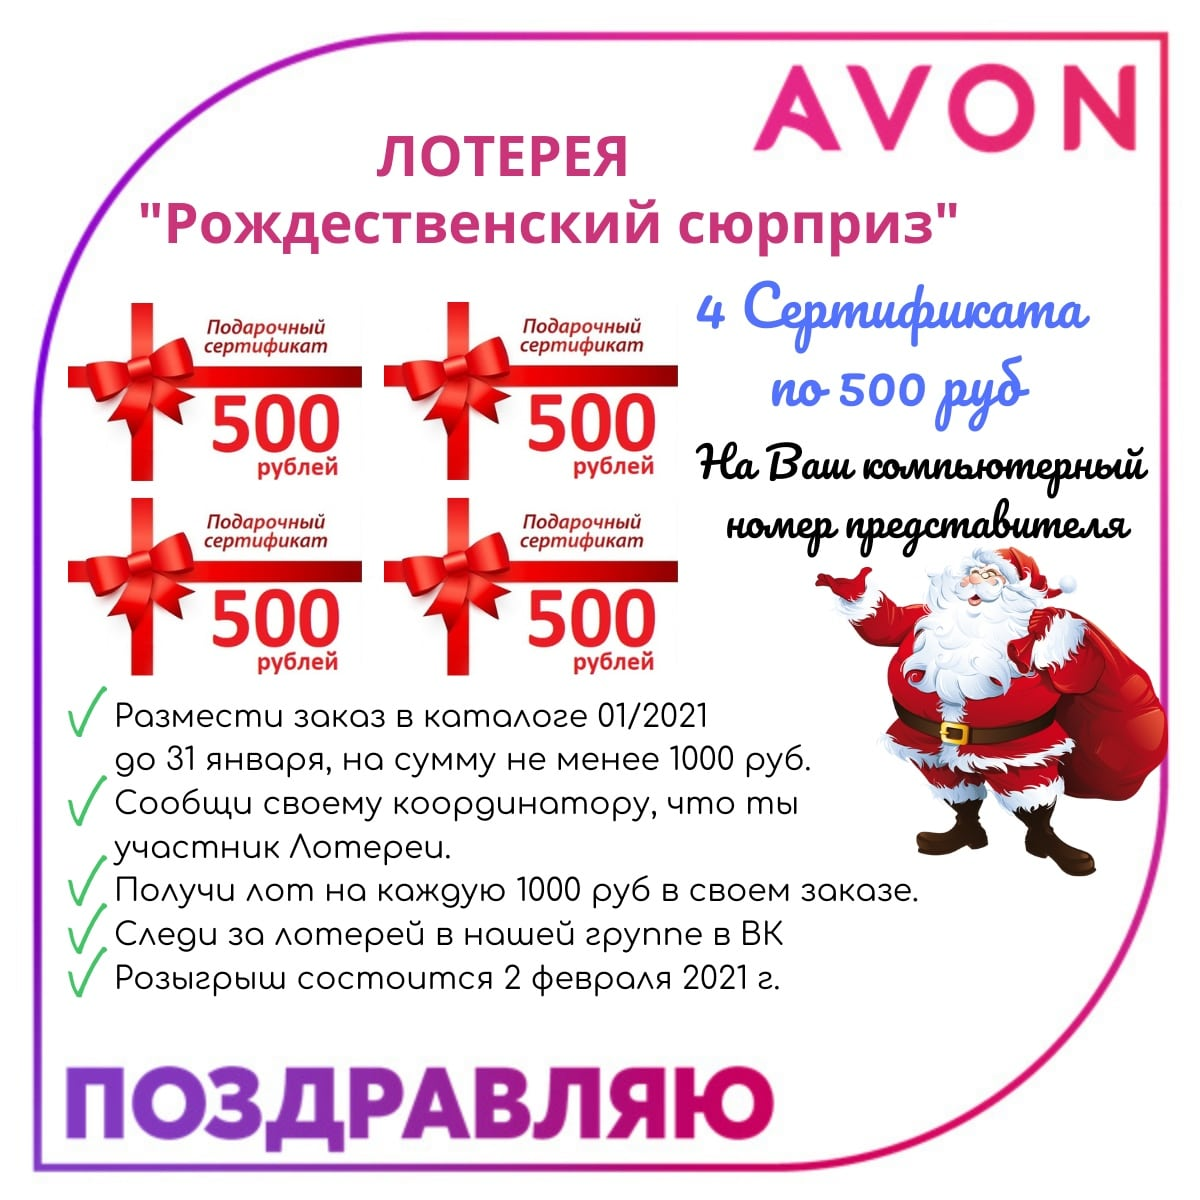 Лотерея Avon 1 каталог 2021